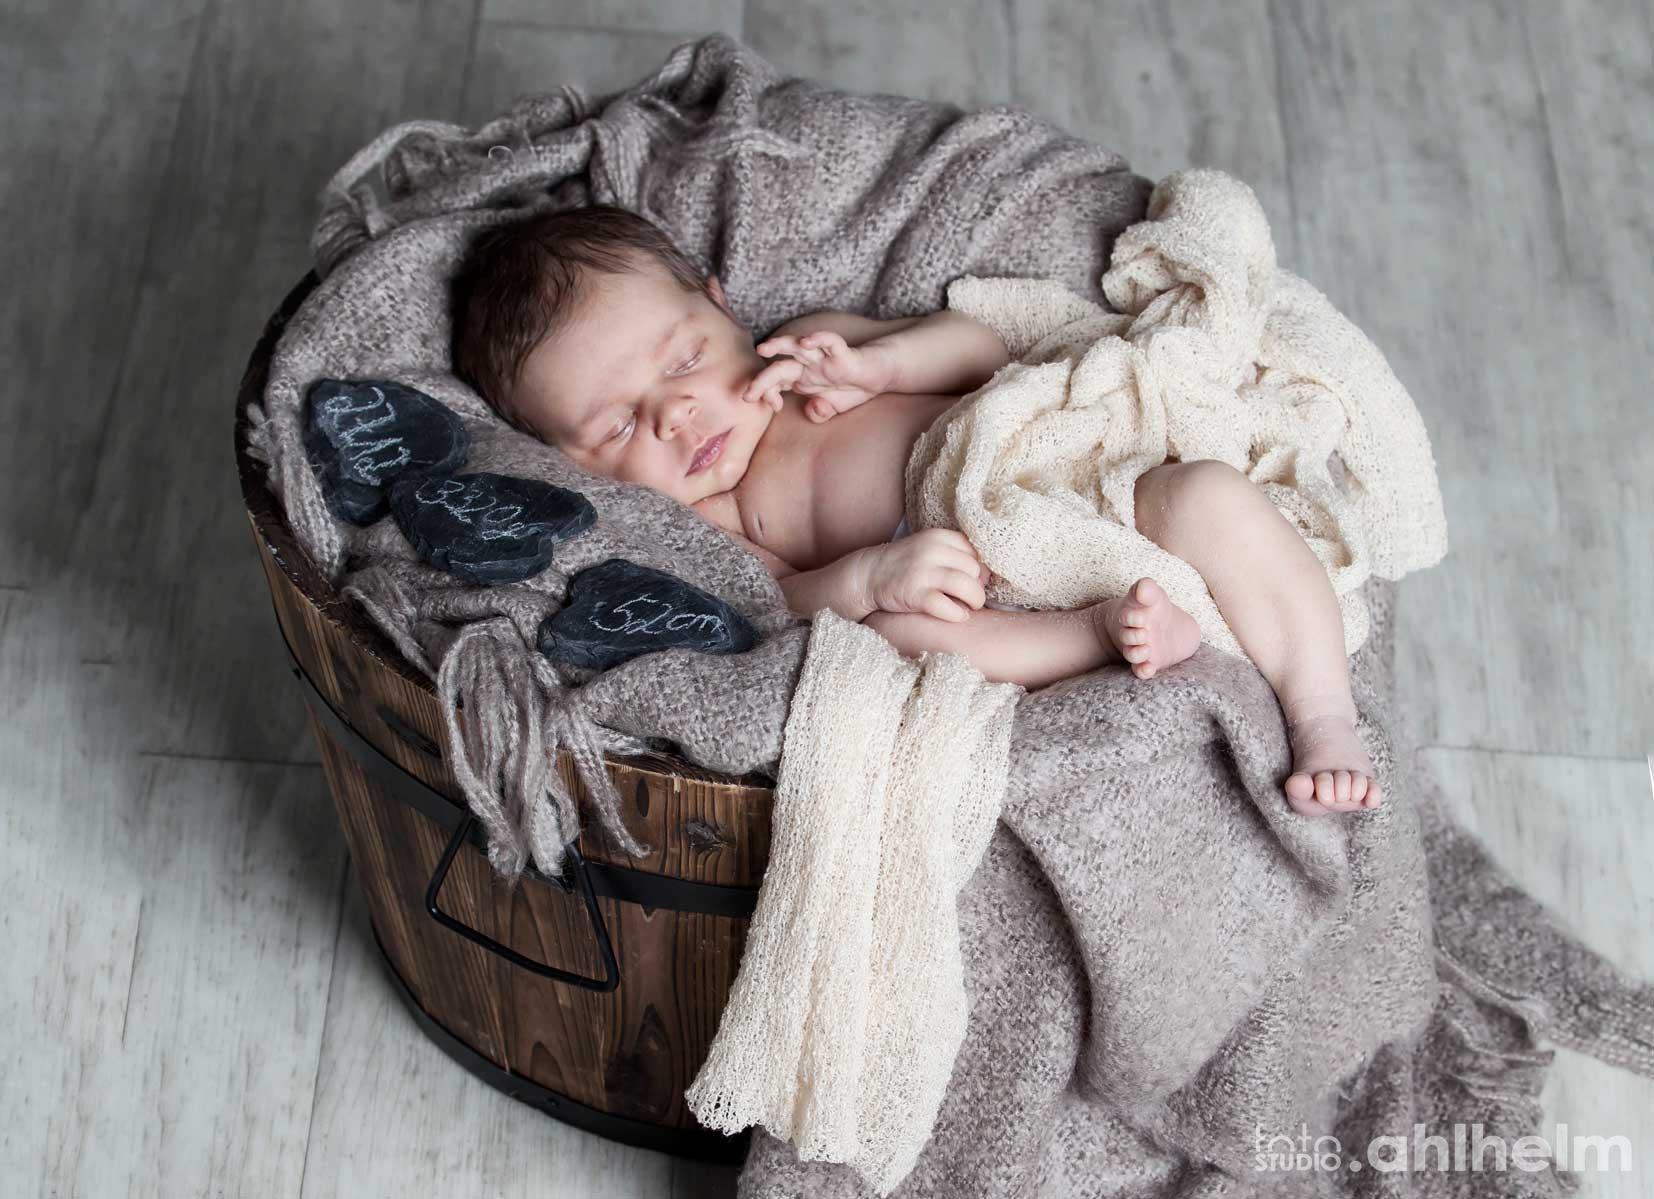 Fotostudio Ahlhelm Newborn 5